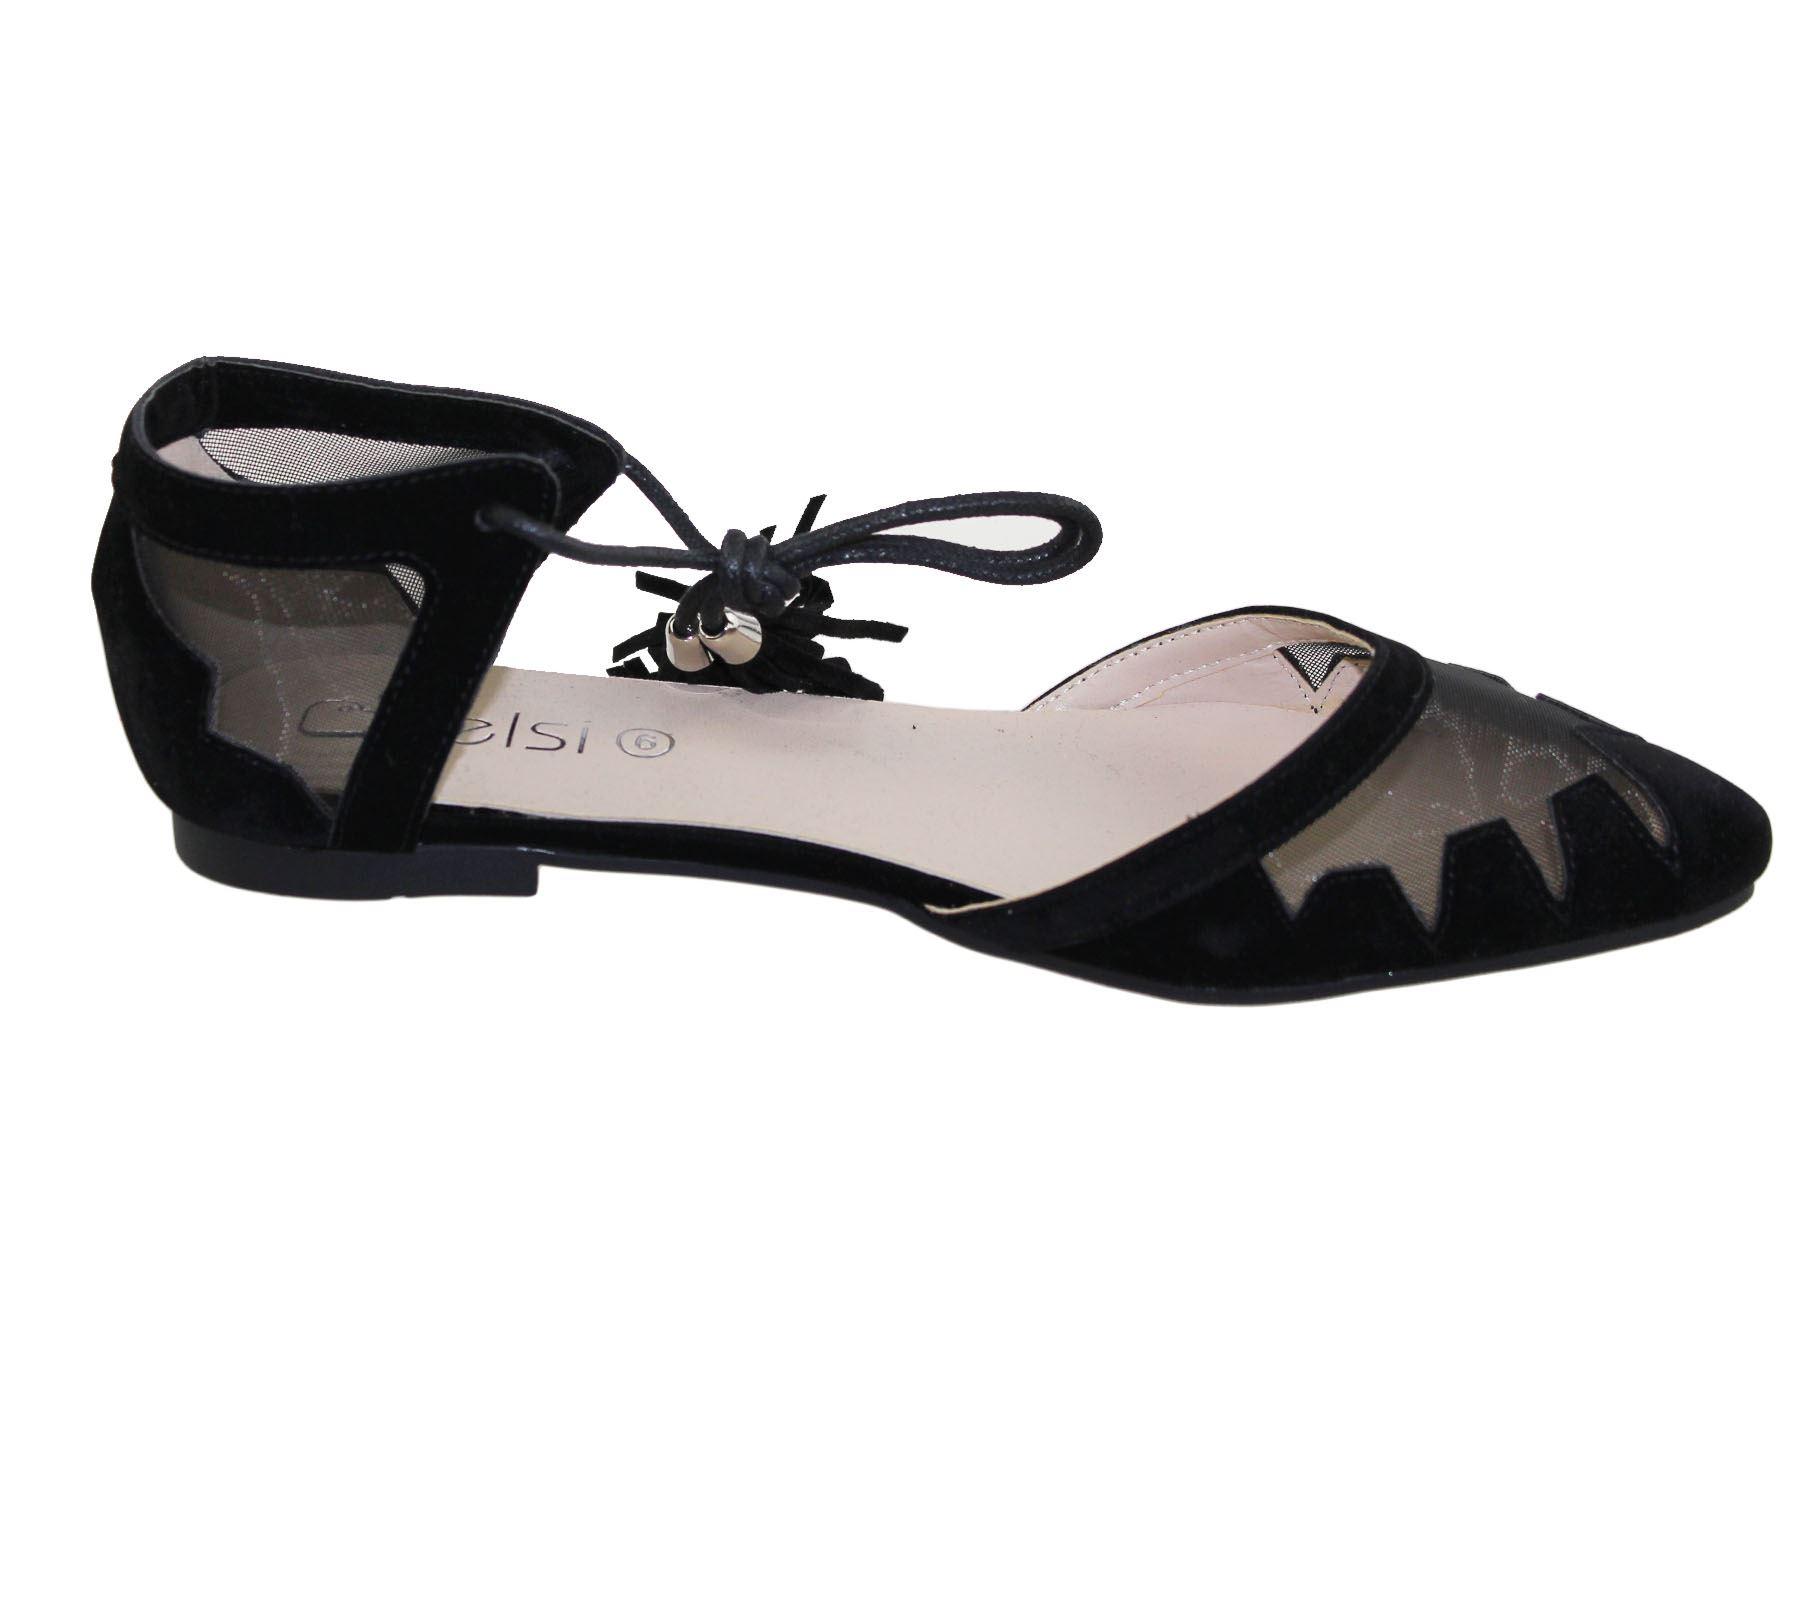 Womens-Flat-Ballerina-Dolly-Pumps-Ballet-Ladies-Summer-Mesh-Tassel-Shoes-Sandals thumbnail 40